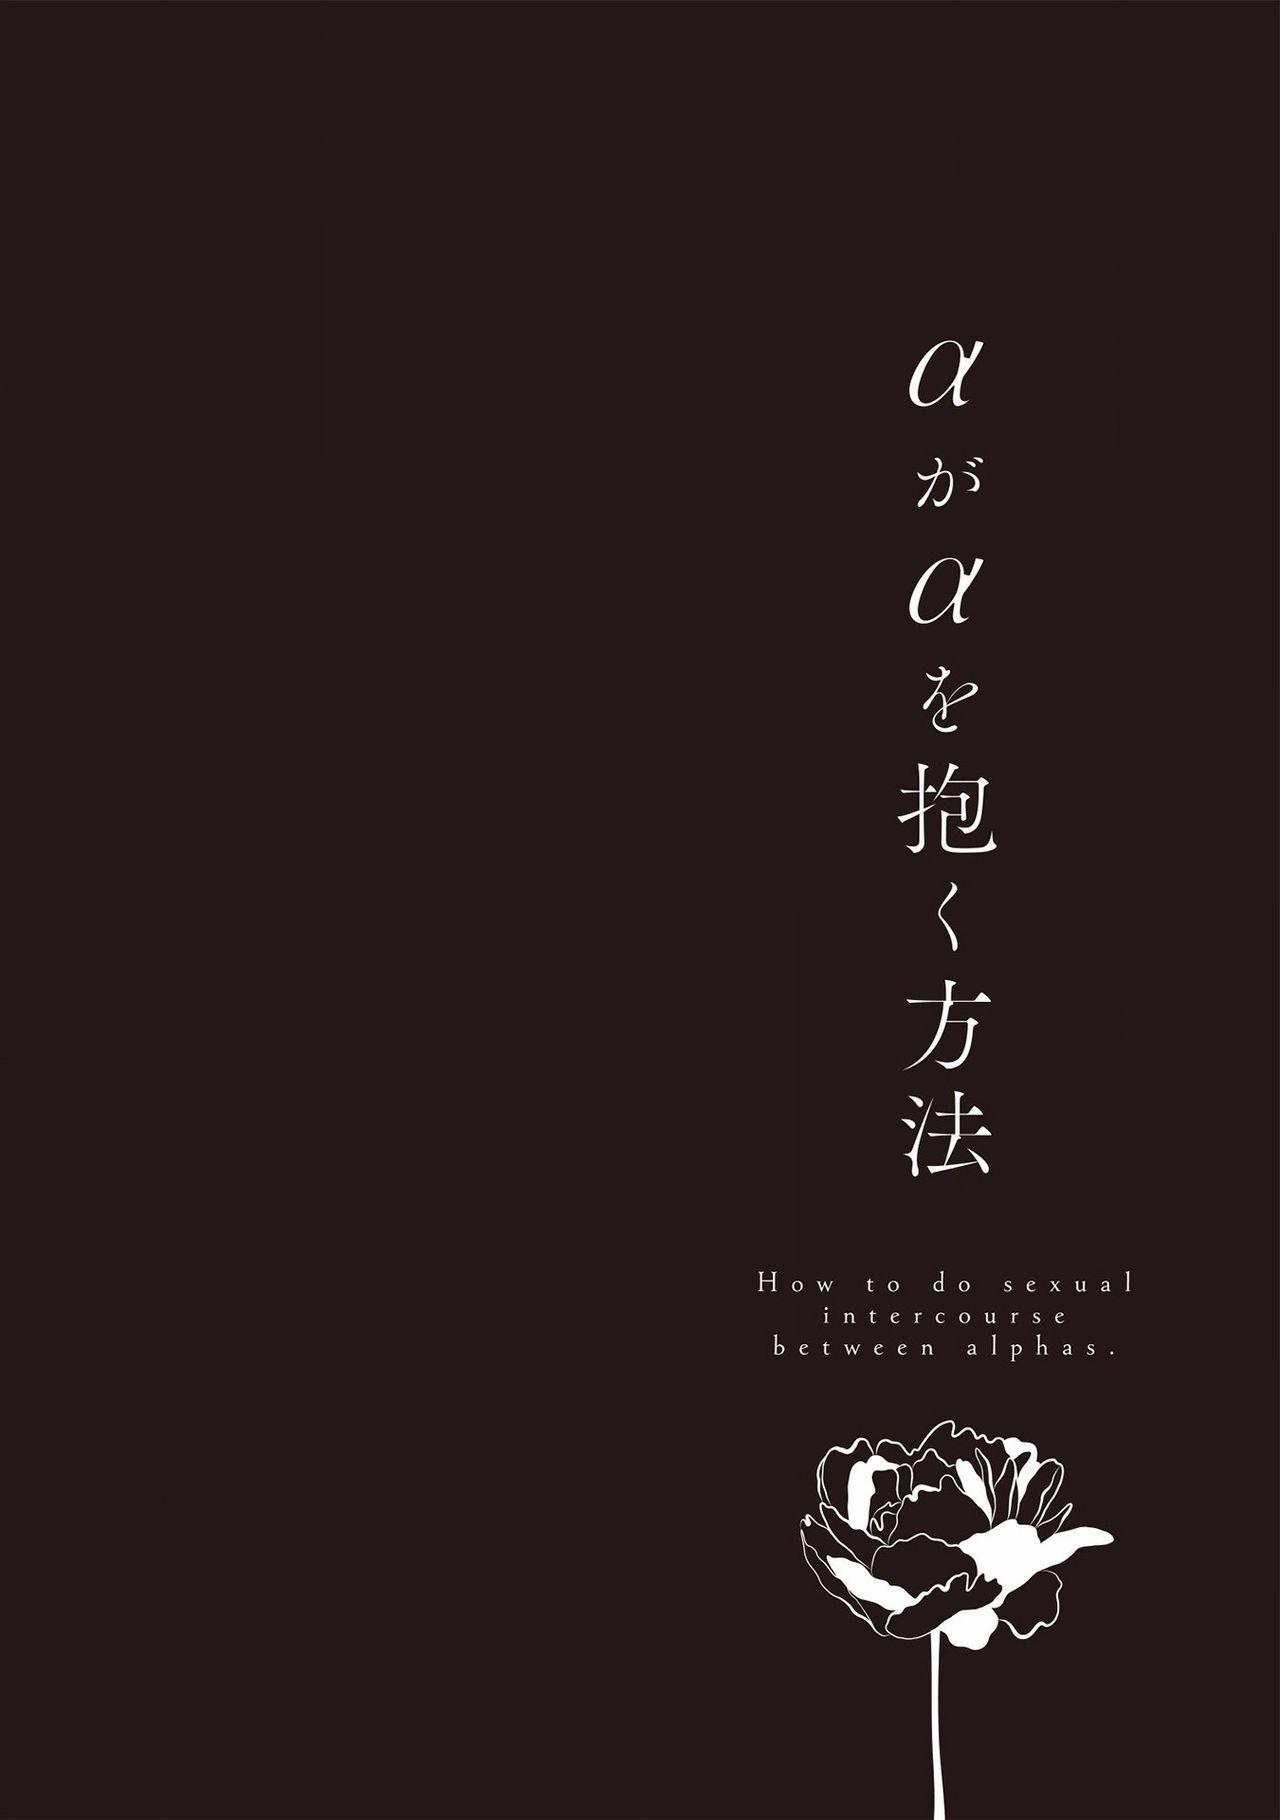 Alpha ga Alpha o Daku Houhou   α与α做爱的方法 1-6 完结 123